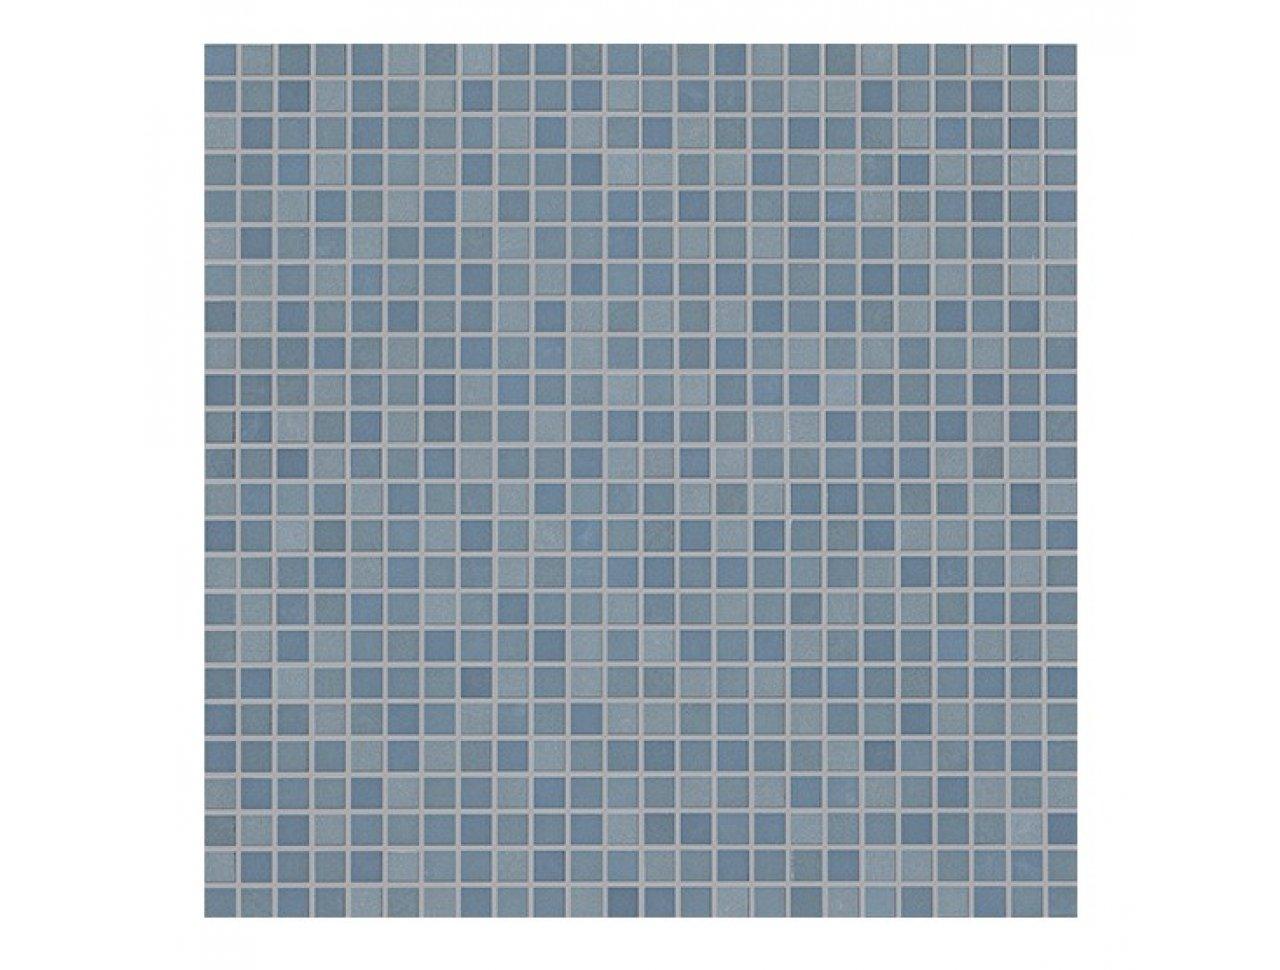 Мозаика FAP Color Now Avio Micromosaico 30.5 x 30.5 см, Арт. fMS8